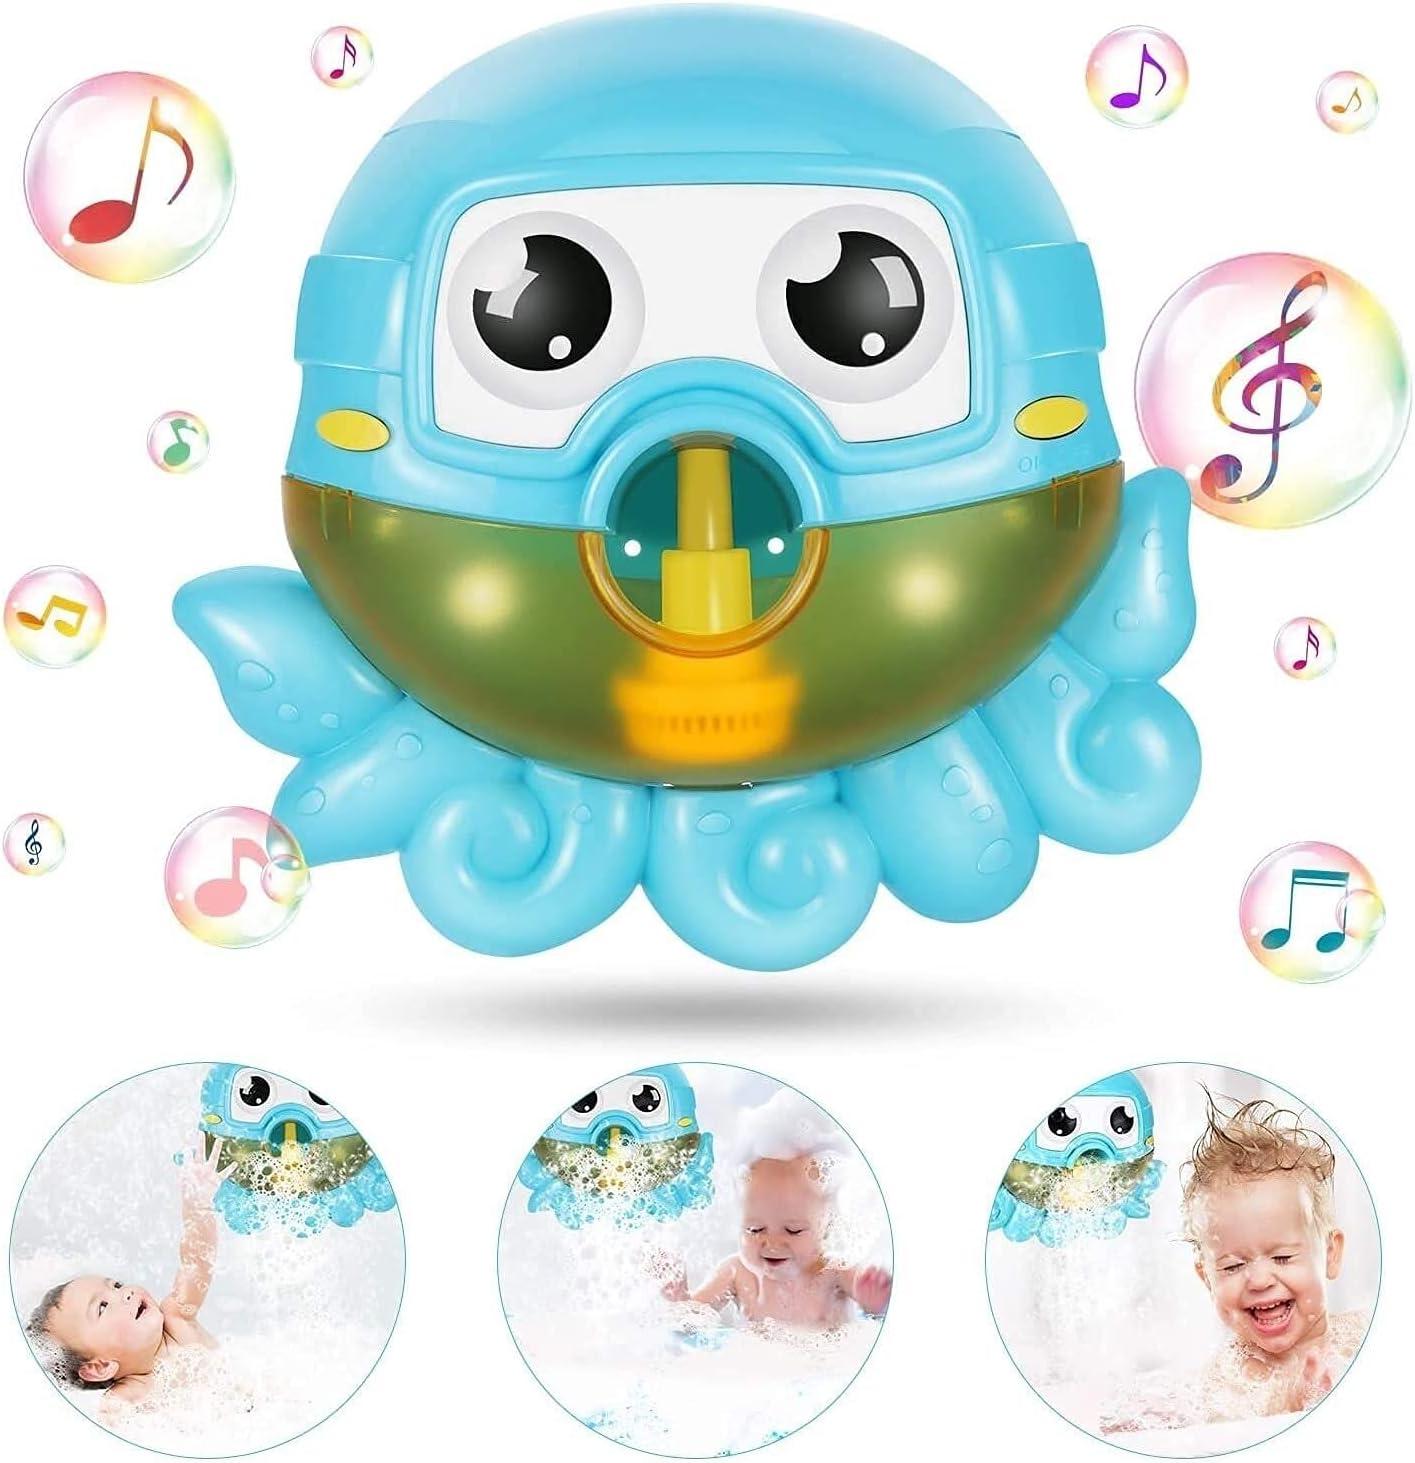 Bubble Bath Toys, Automatic Octopus Music Bubble Machine with 42